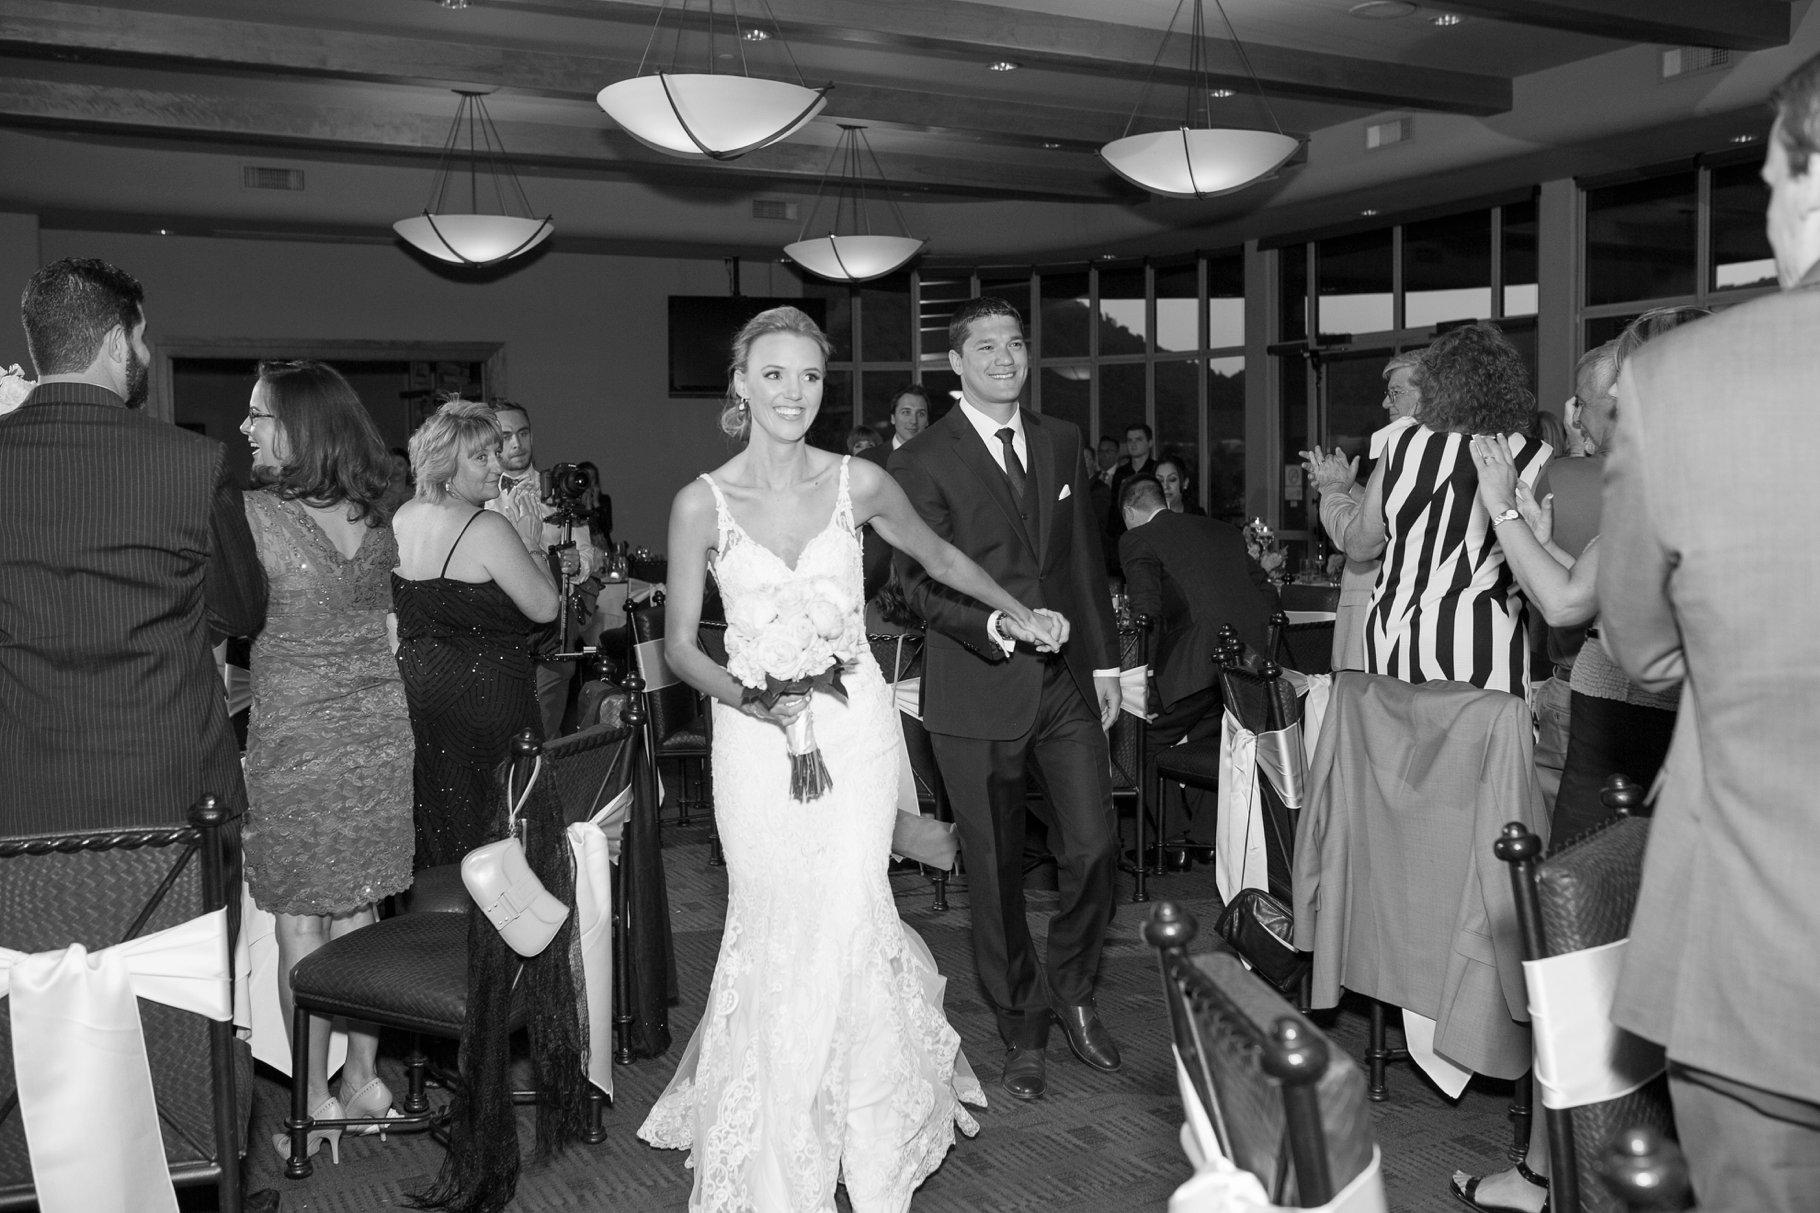 sedona wedding-500_GRETCHEN WAKEMAN PHOTOGRAPHY.jpg